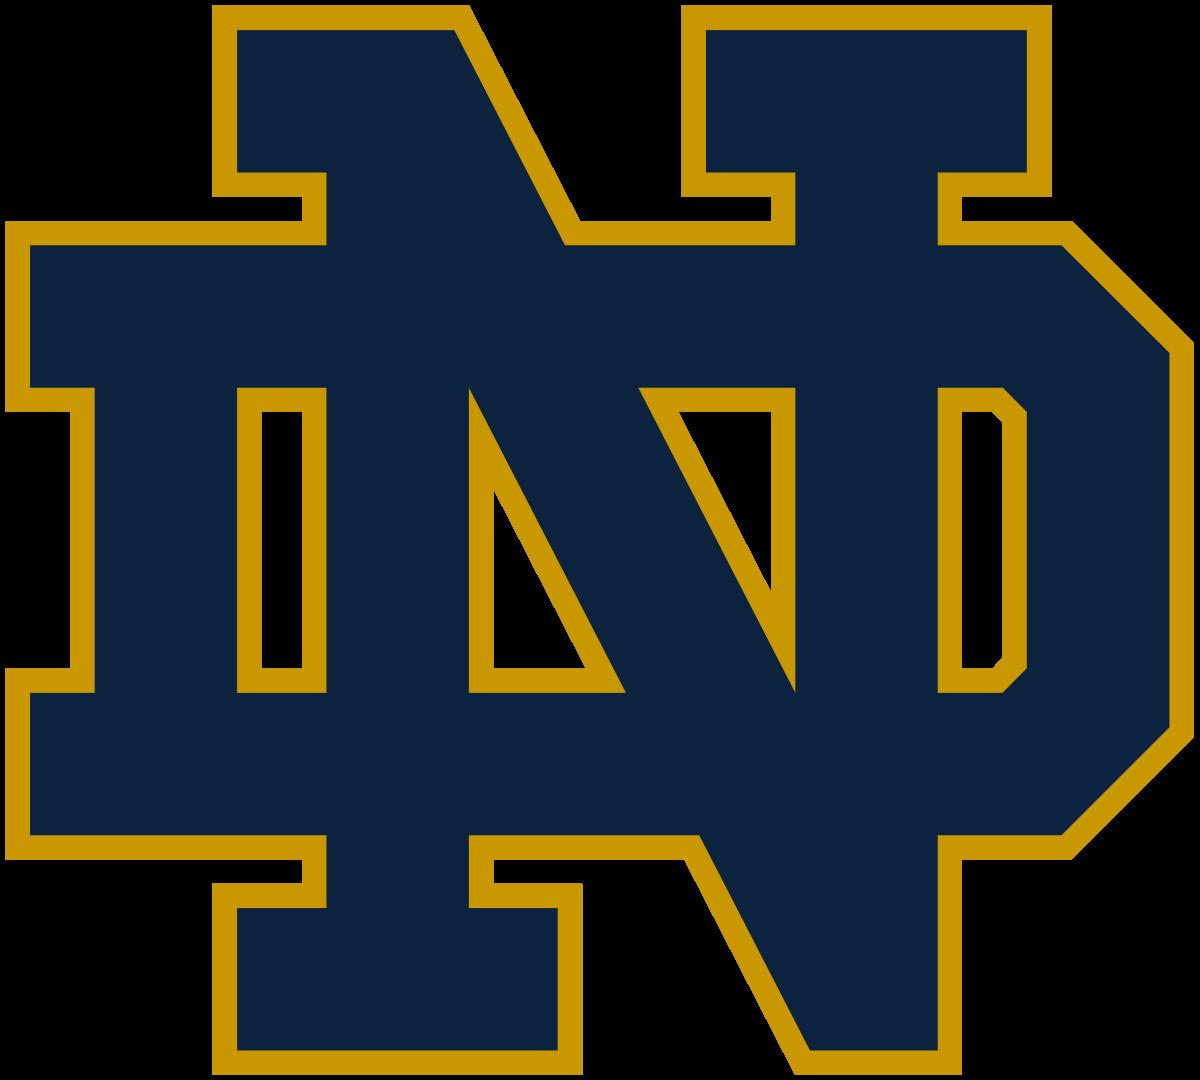 Notre Dame Fighting Irish Football Logo